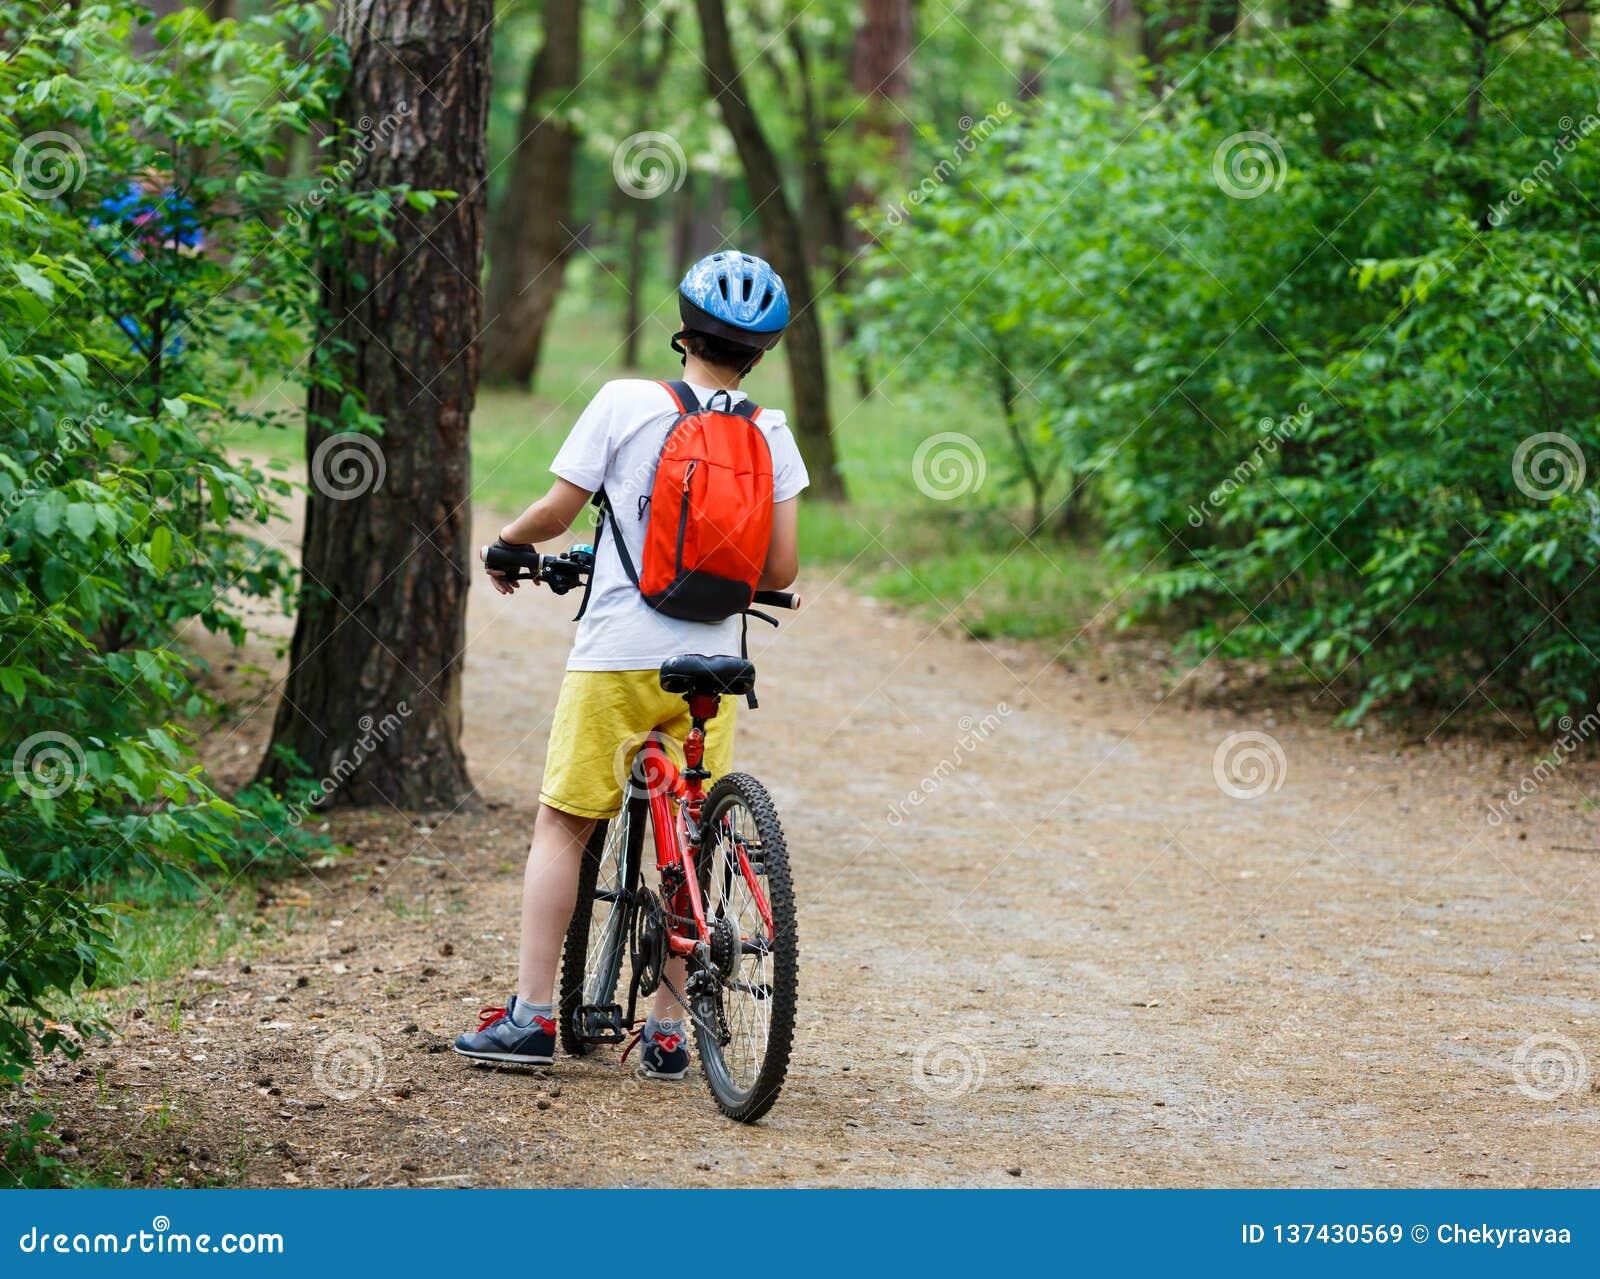 Barntonåring på cykelritt i skog på våren eller sommar Lycklig le pojke som utomhus cyklar i blå hjälm aktiv livsstil